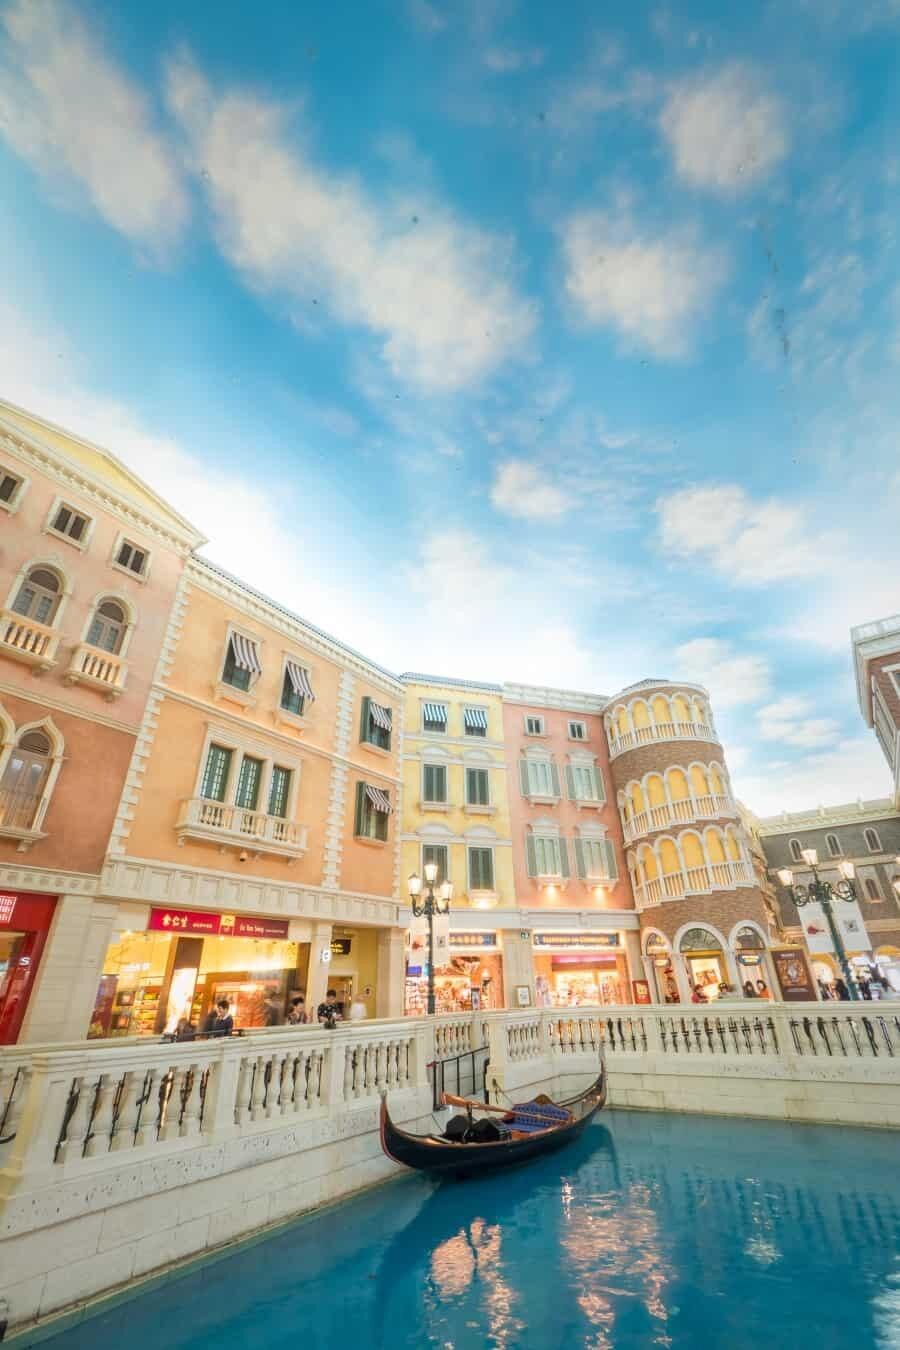 The Venetian Macao - Macao photography locations